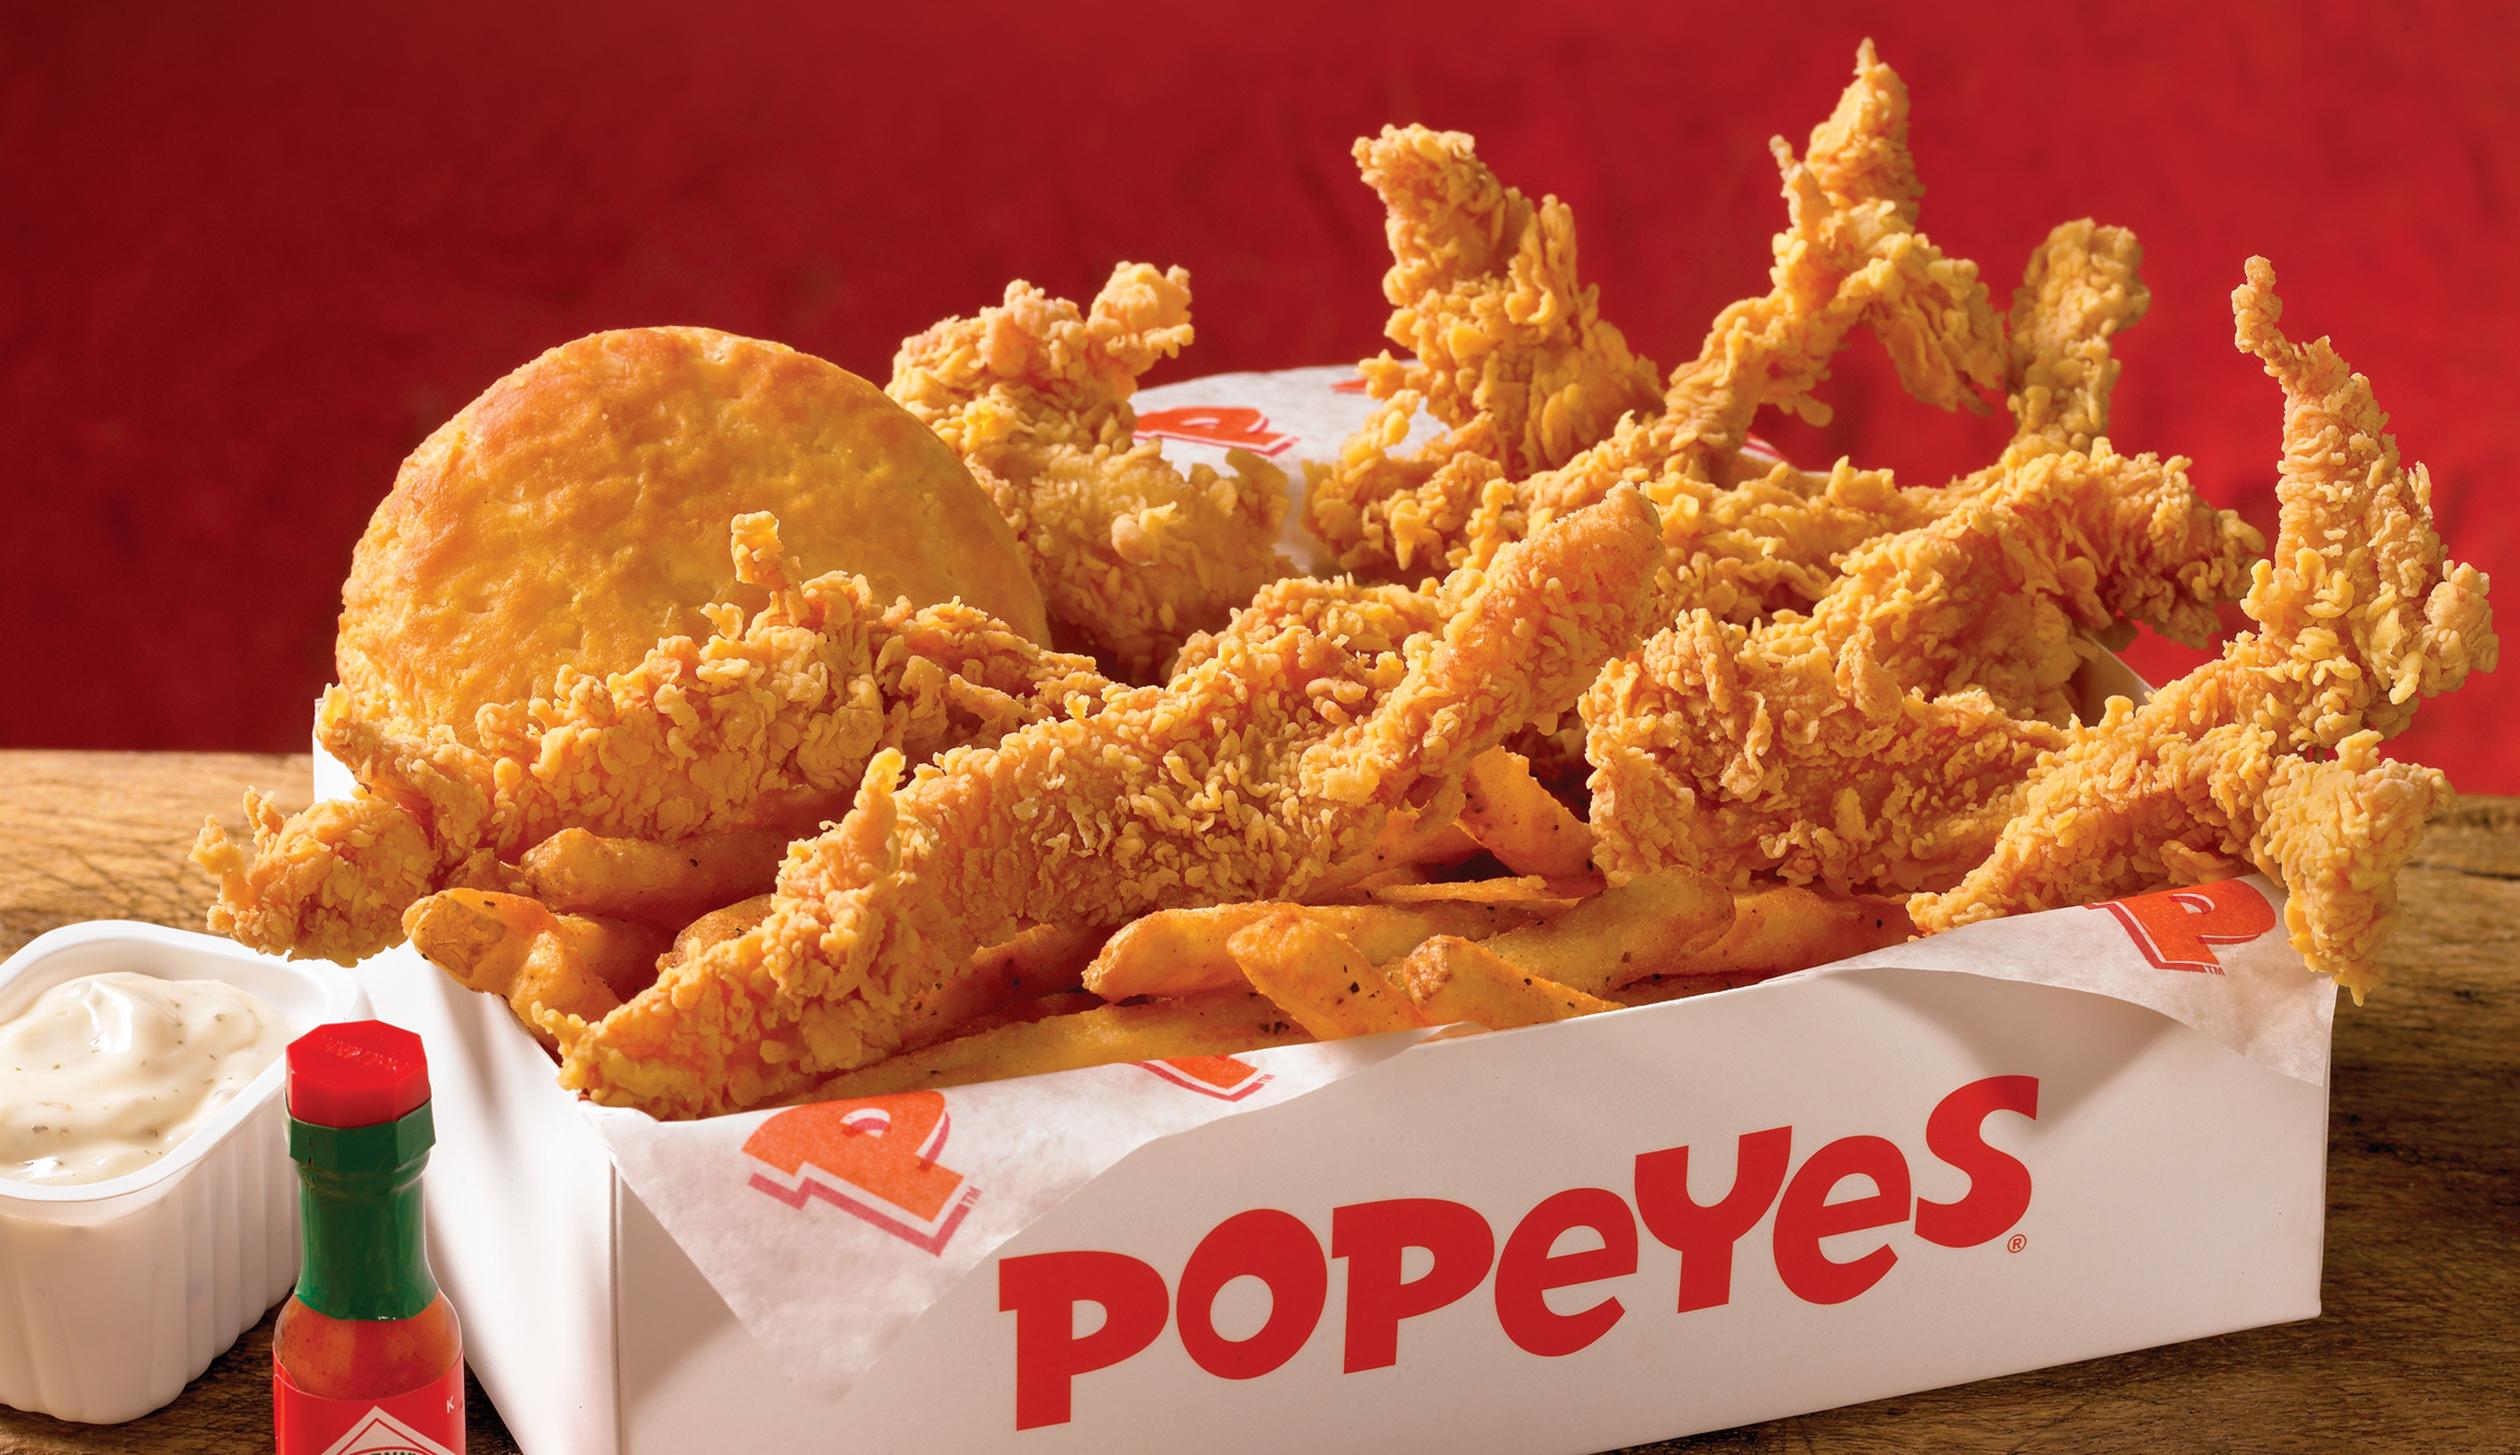 Popeyes chicken.